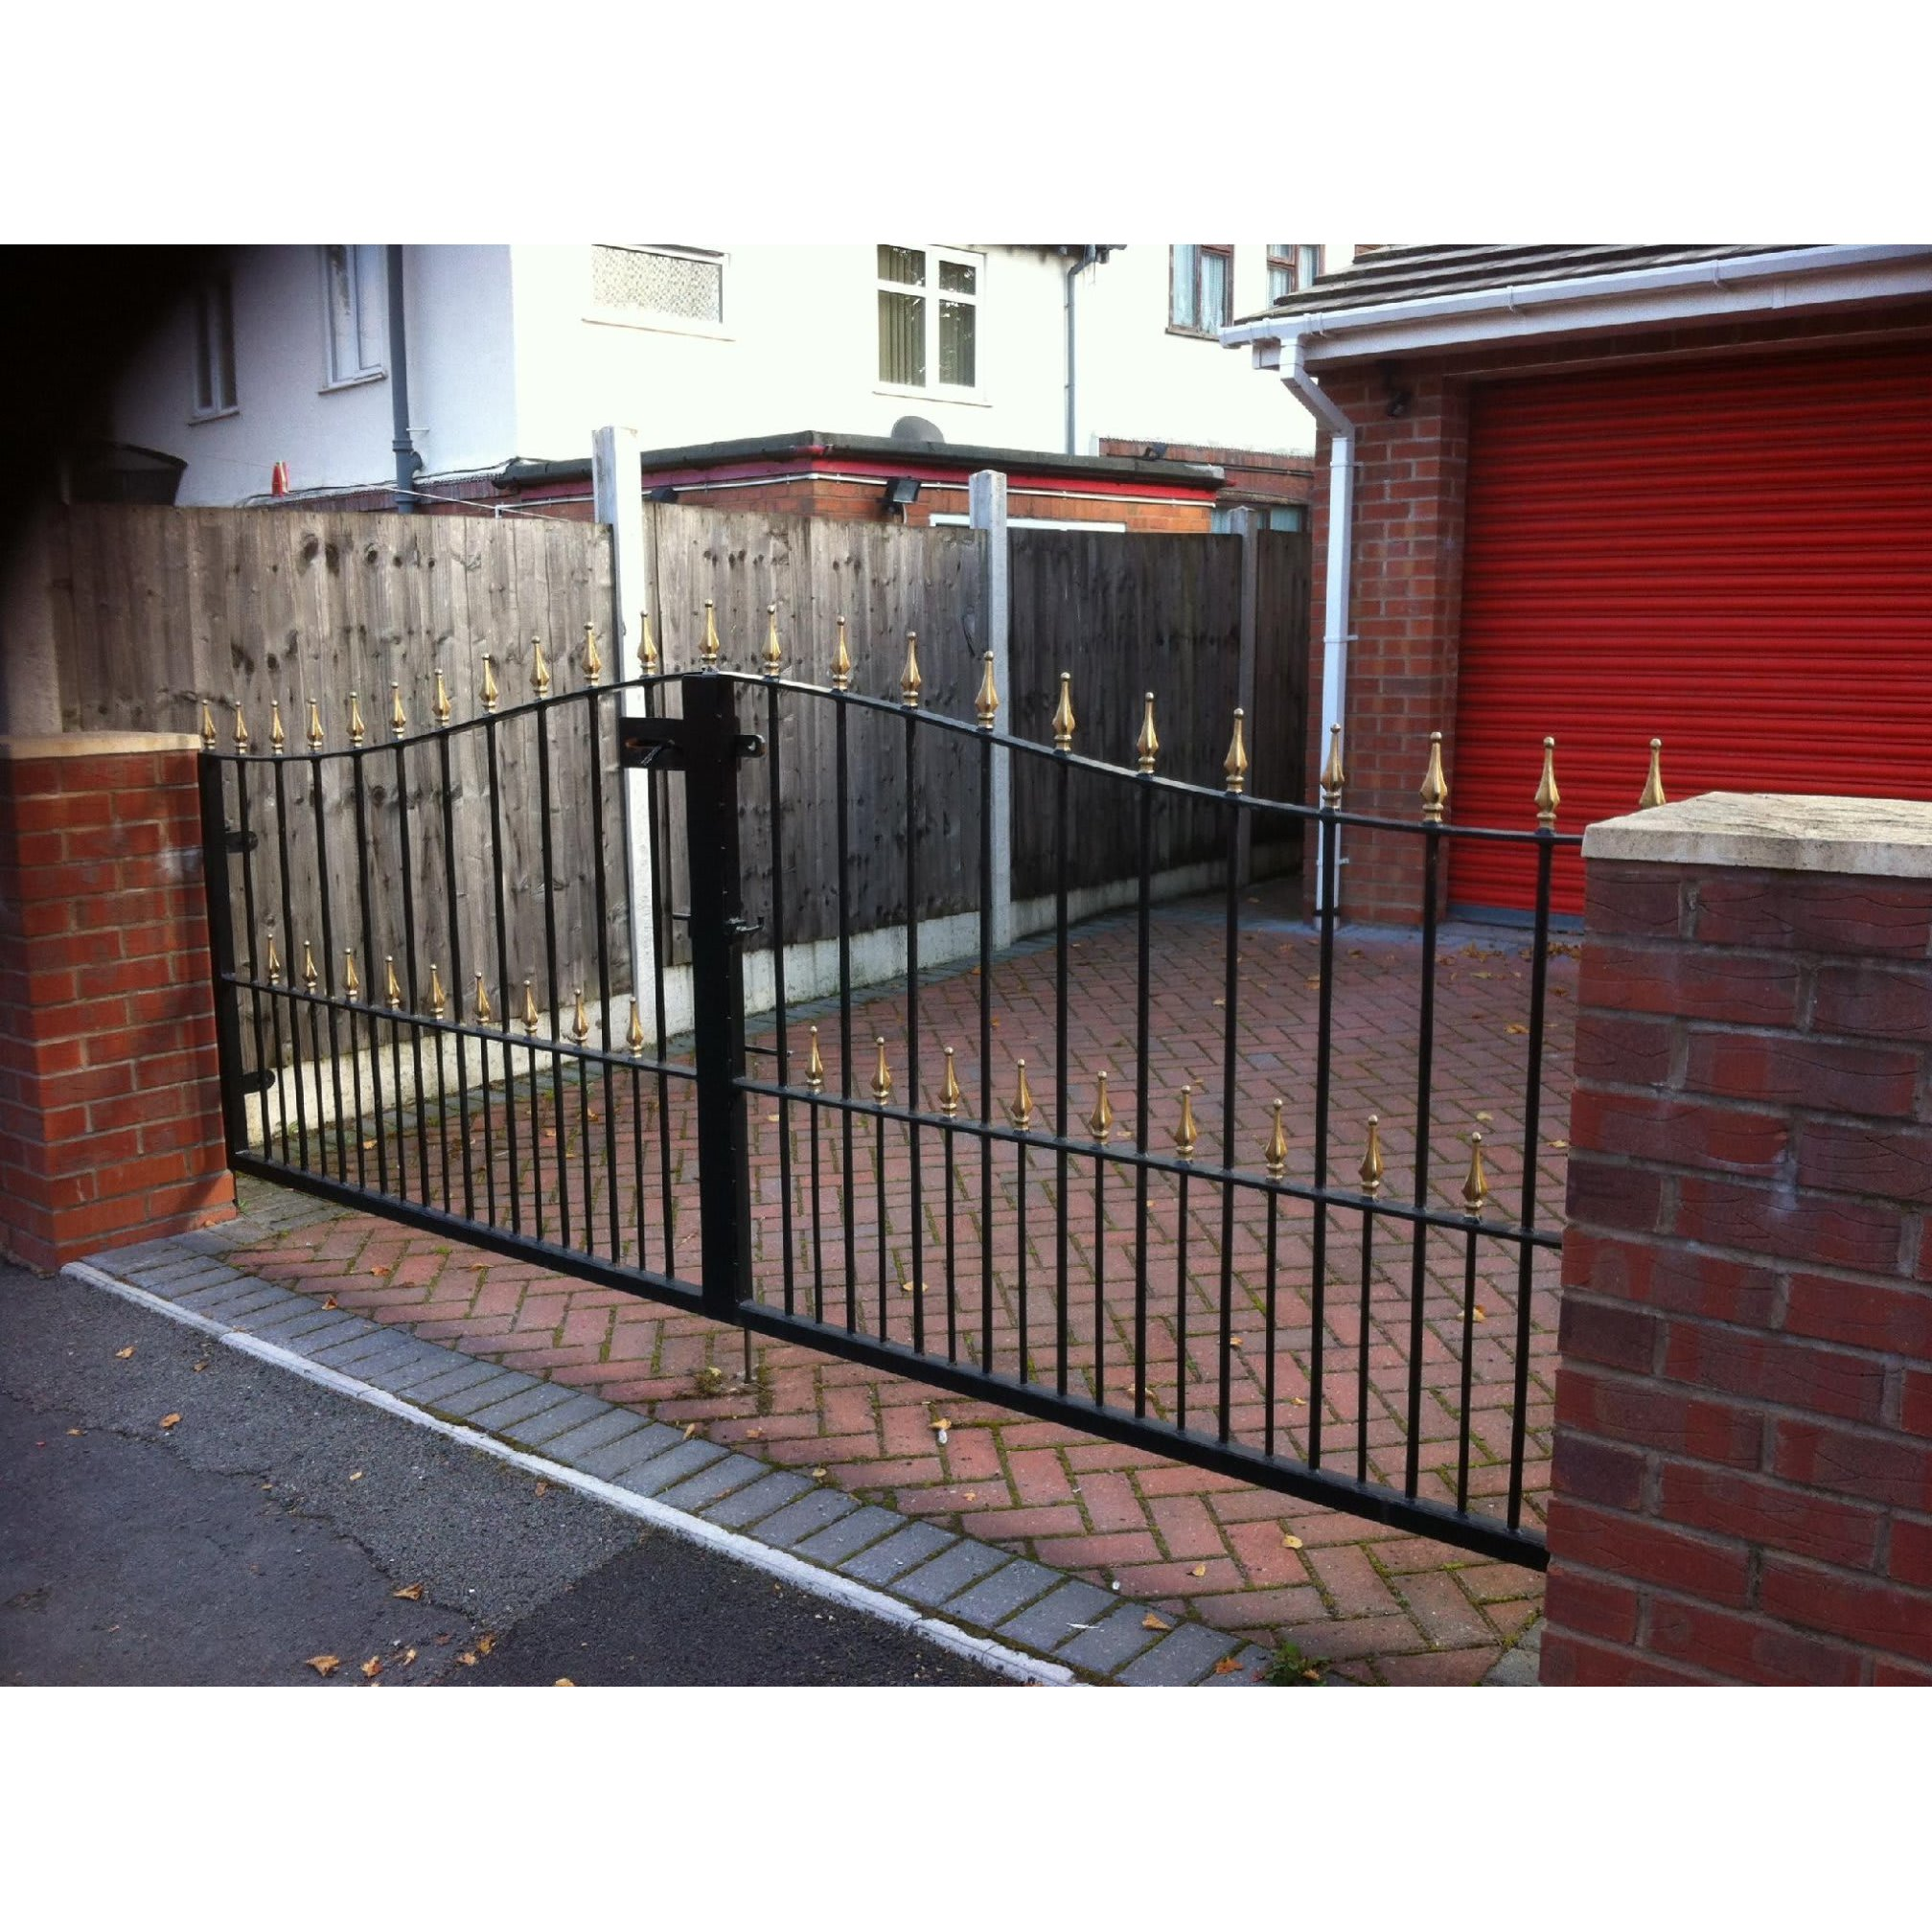 Haney D J Blacksmiths Fabrications - Rowley Regis, West Midlands B65 8JQ - 01384 239228 | ShowMeLocal.com